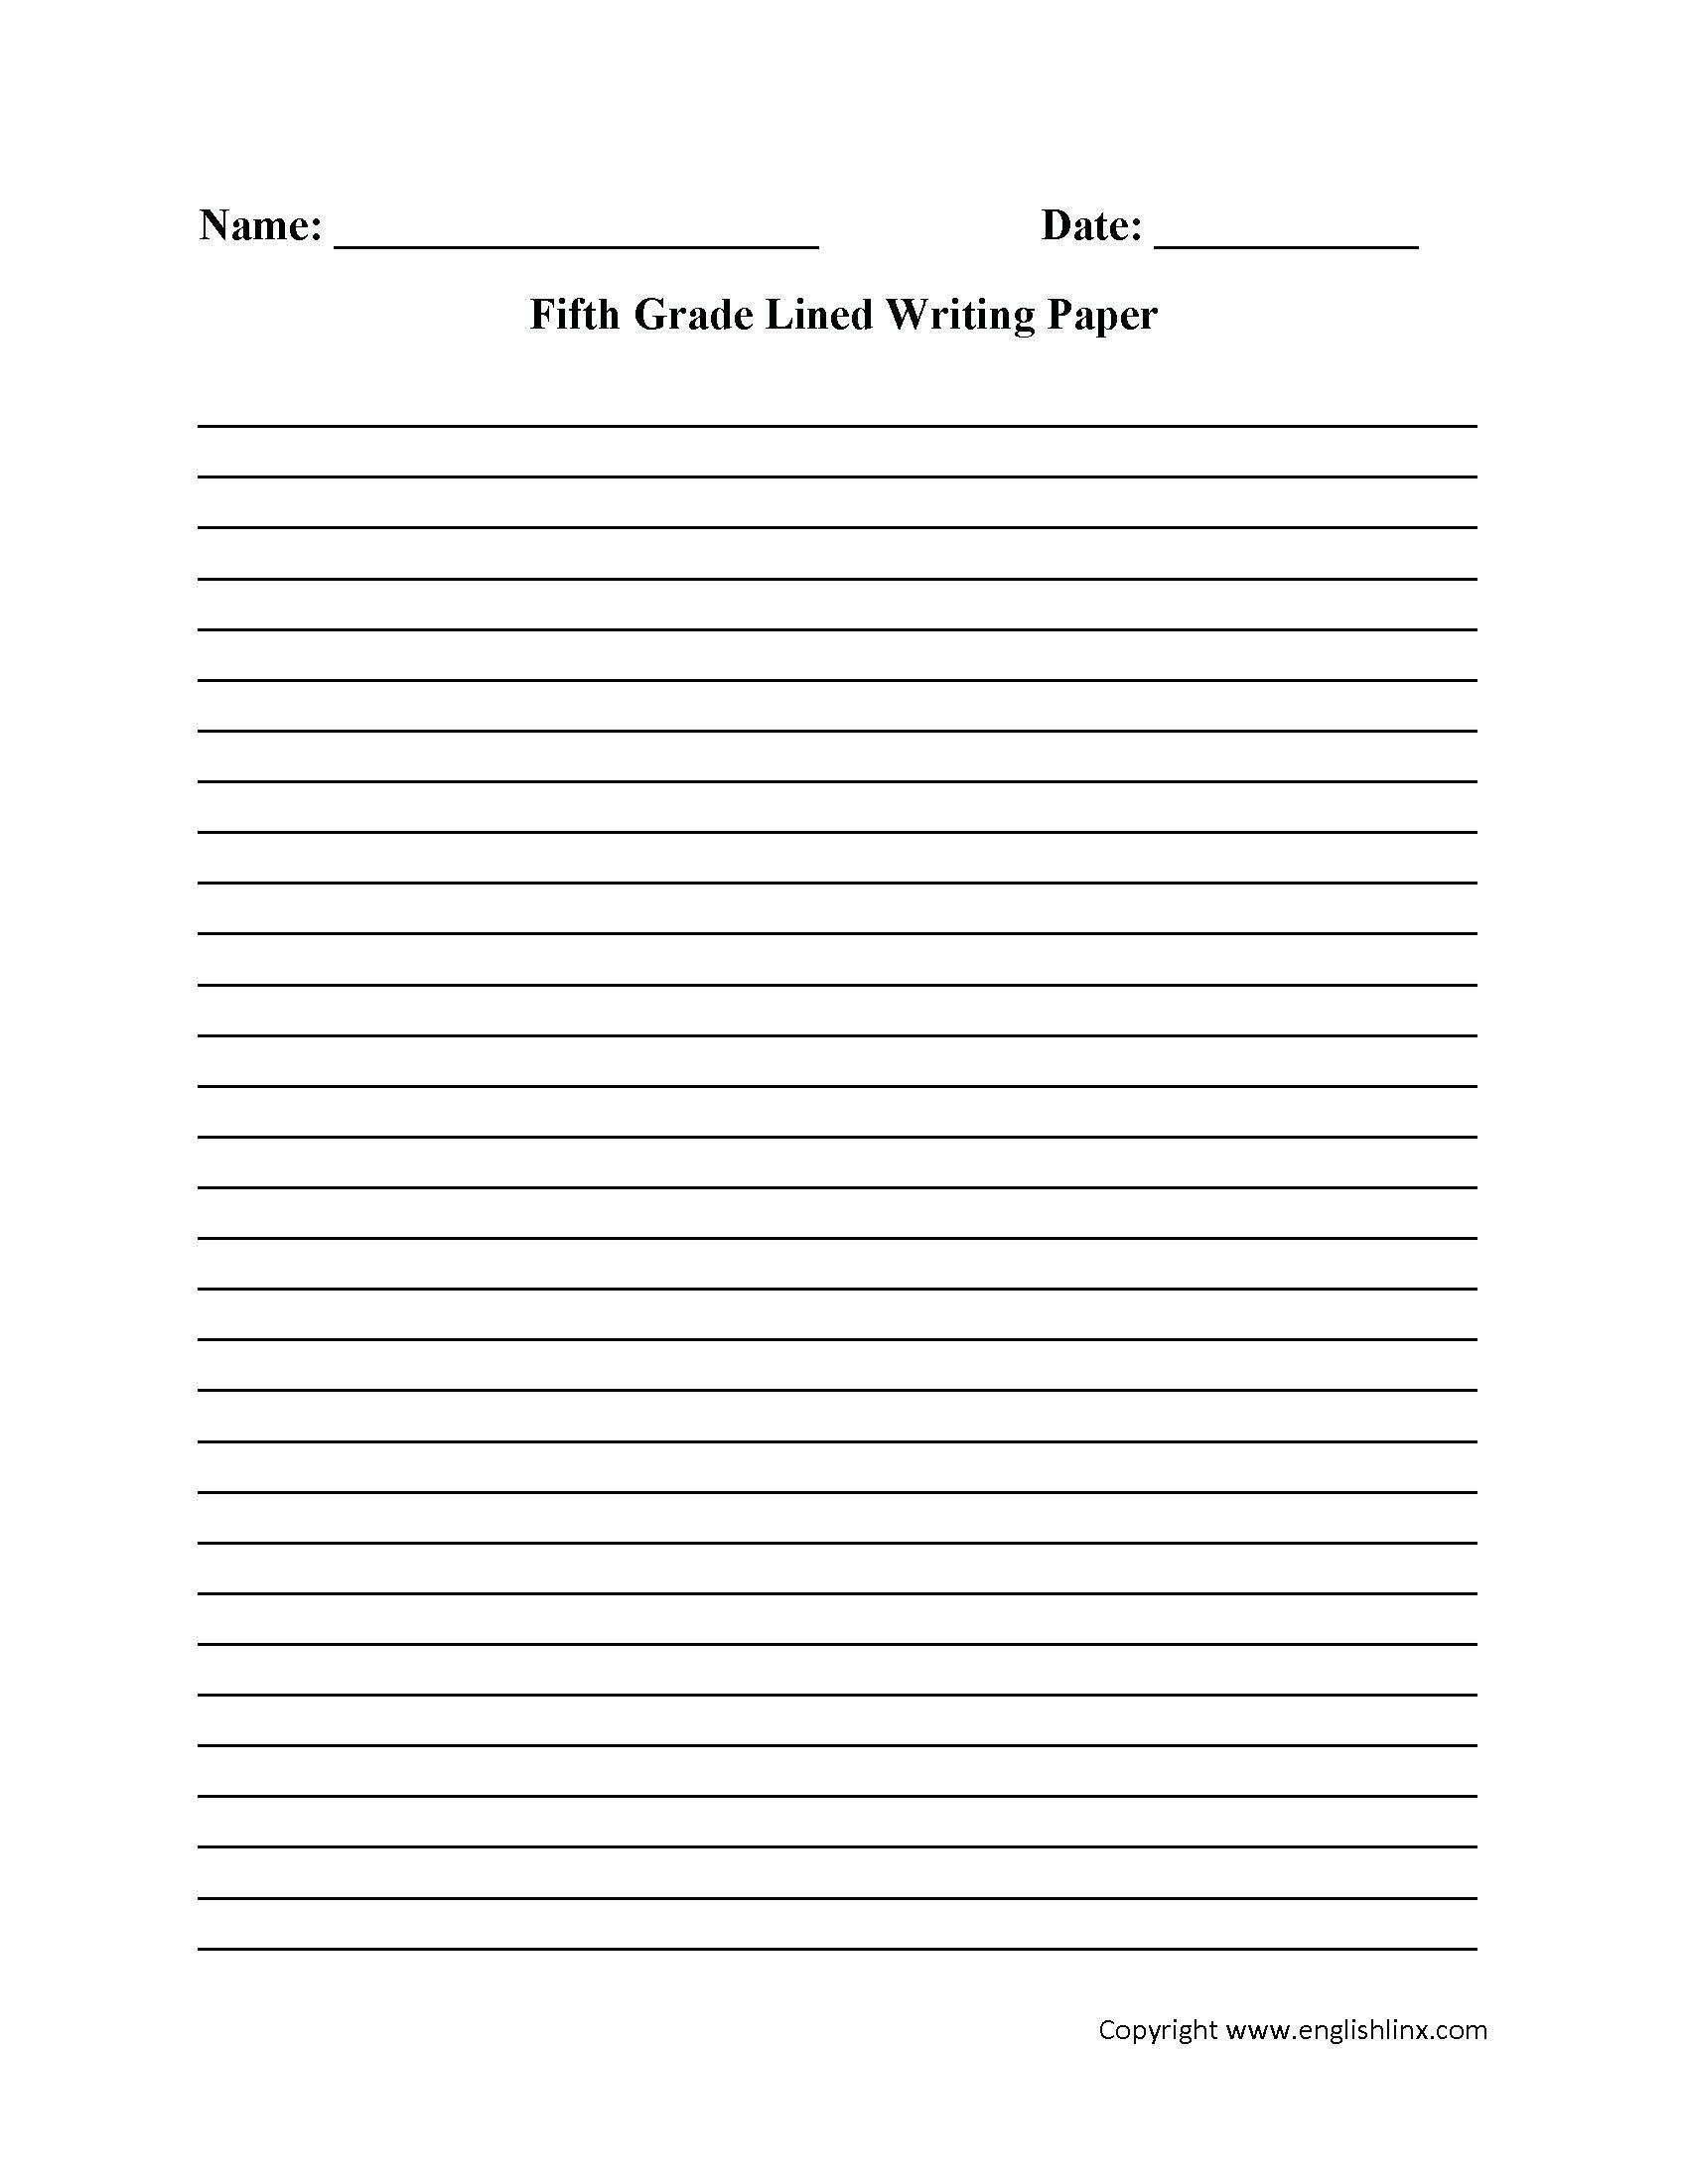 Cursive Handwriting Paper Free Cursive Writing Template Worksheet - Free Printable Handwriting Paper